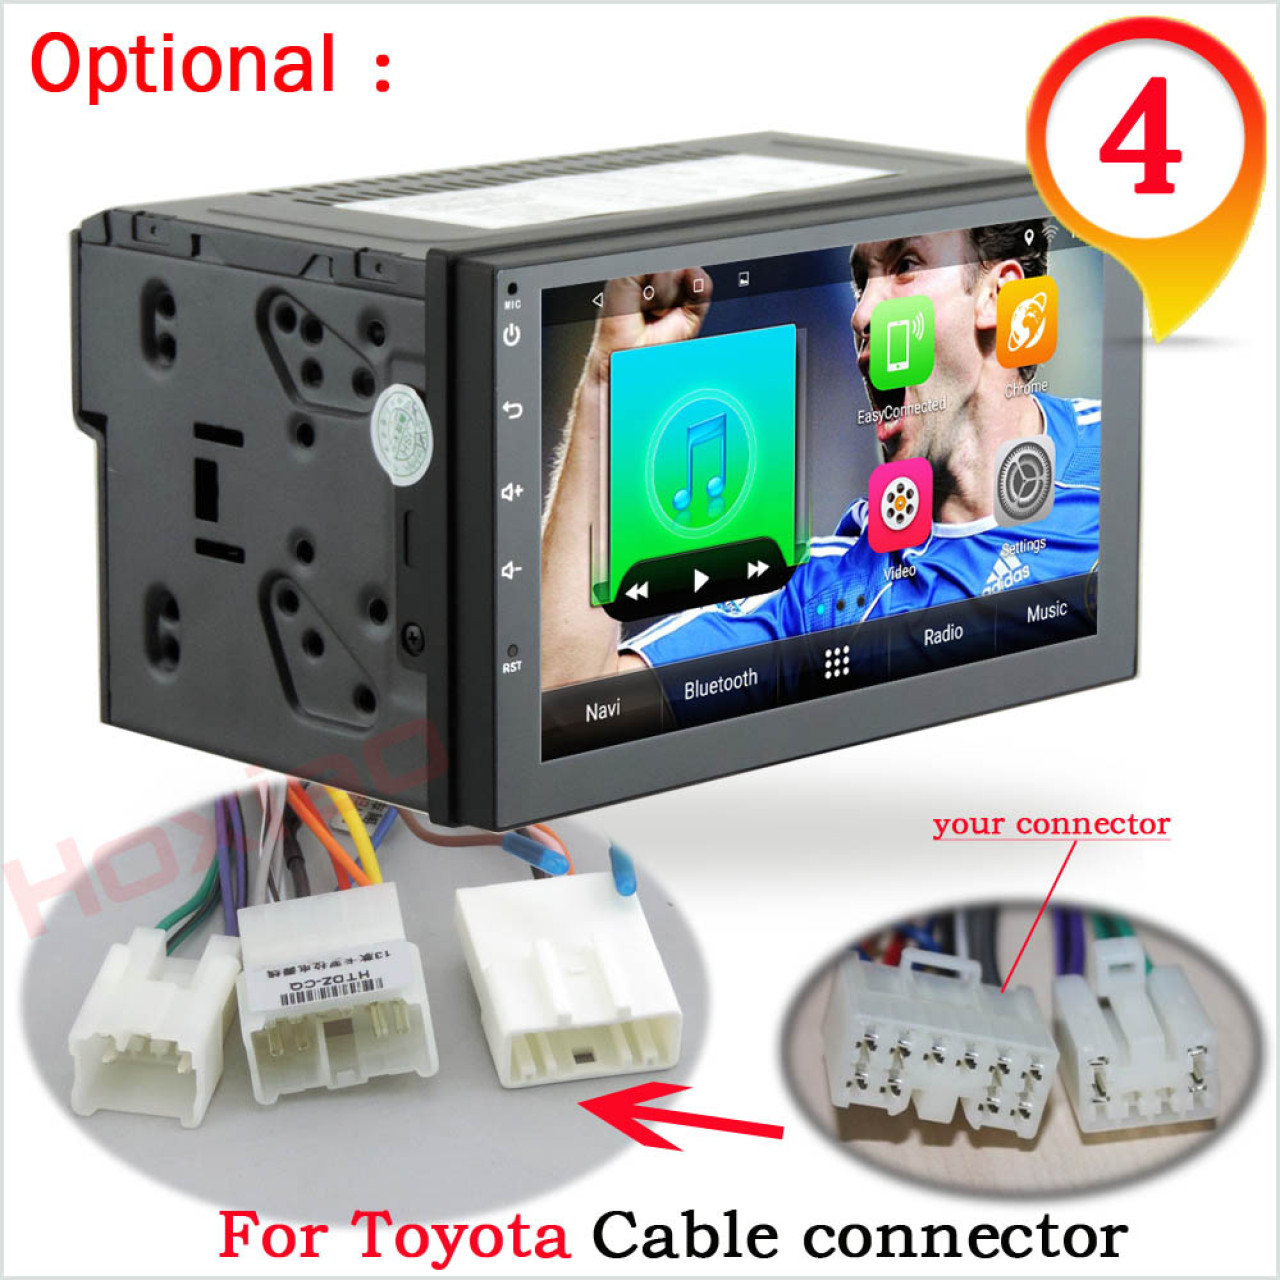 NAVIGATIE CARPAD 2DIN UNIVERSALA CU ANDROID 7.1 ECRAN 7'' CAPACITIV USB INTERNET 3G GPS WAZE DVR